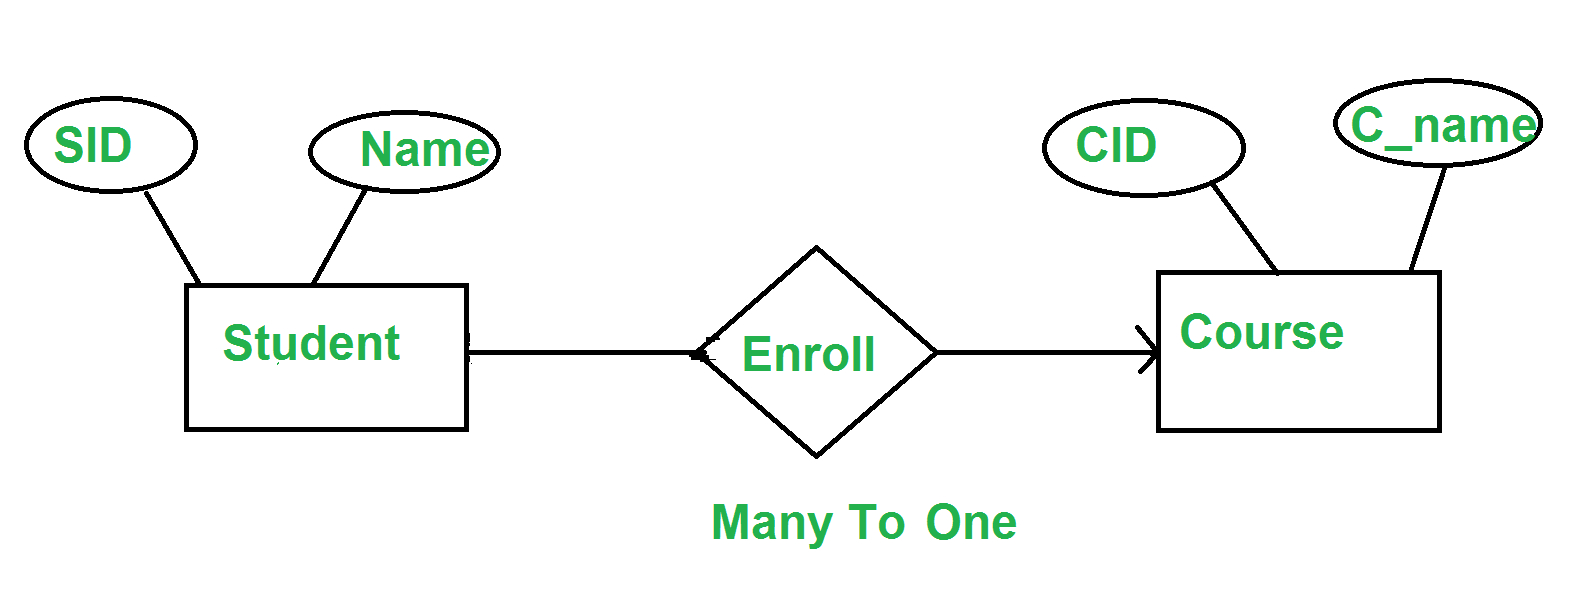 Minimization Of Er Diagrams - Geeksforgeeks for 1 To 1 Relationship Er Diagram